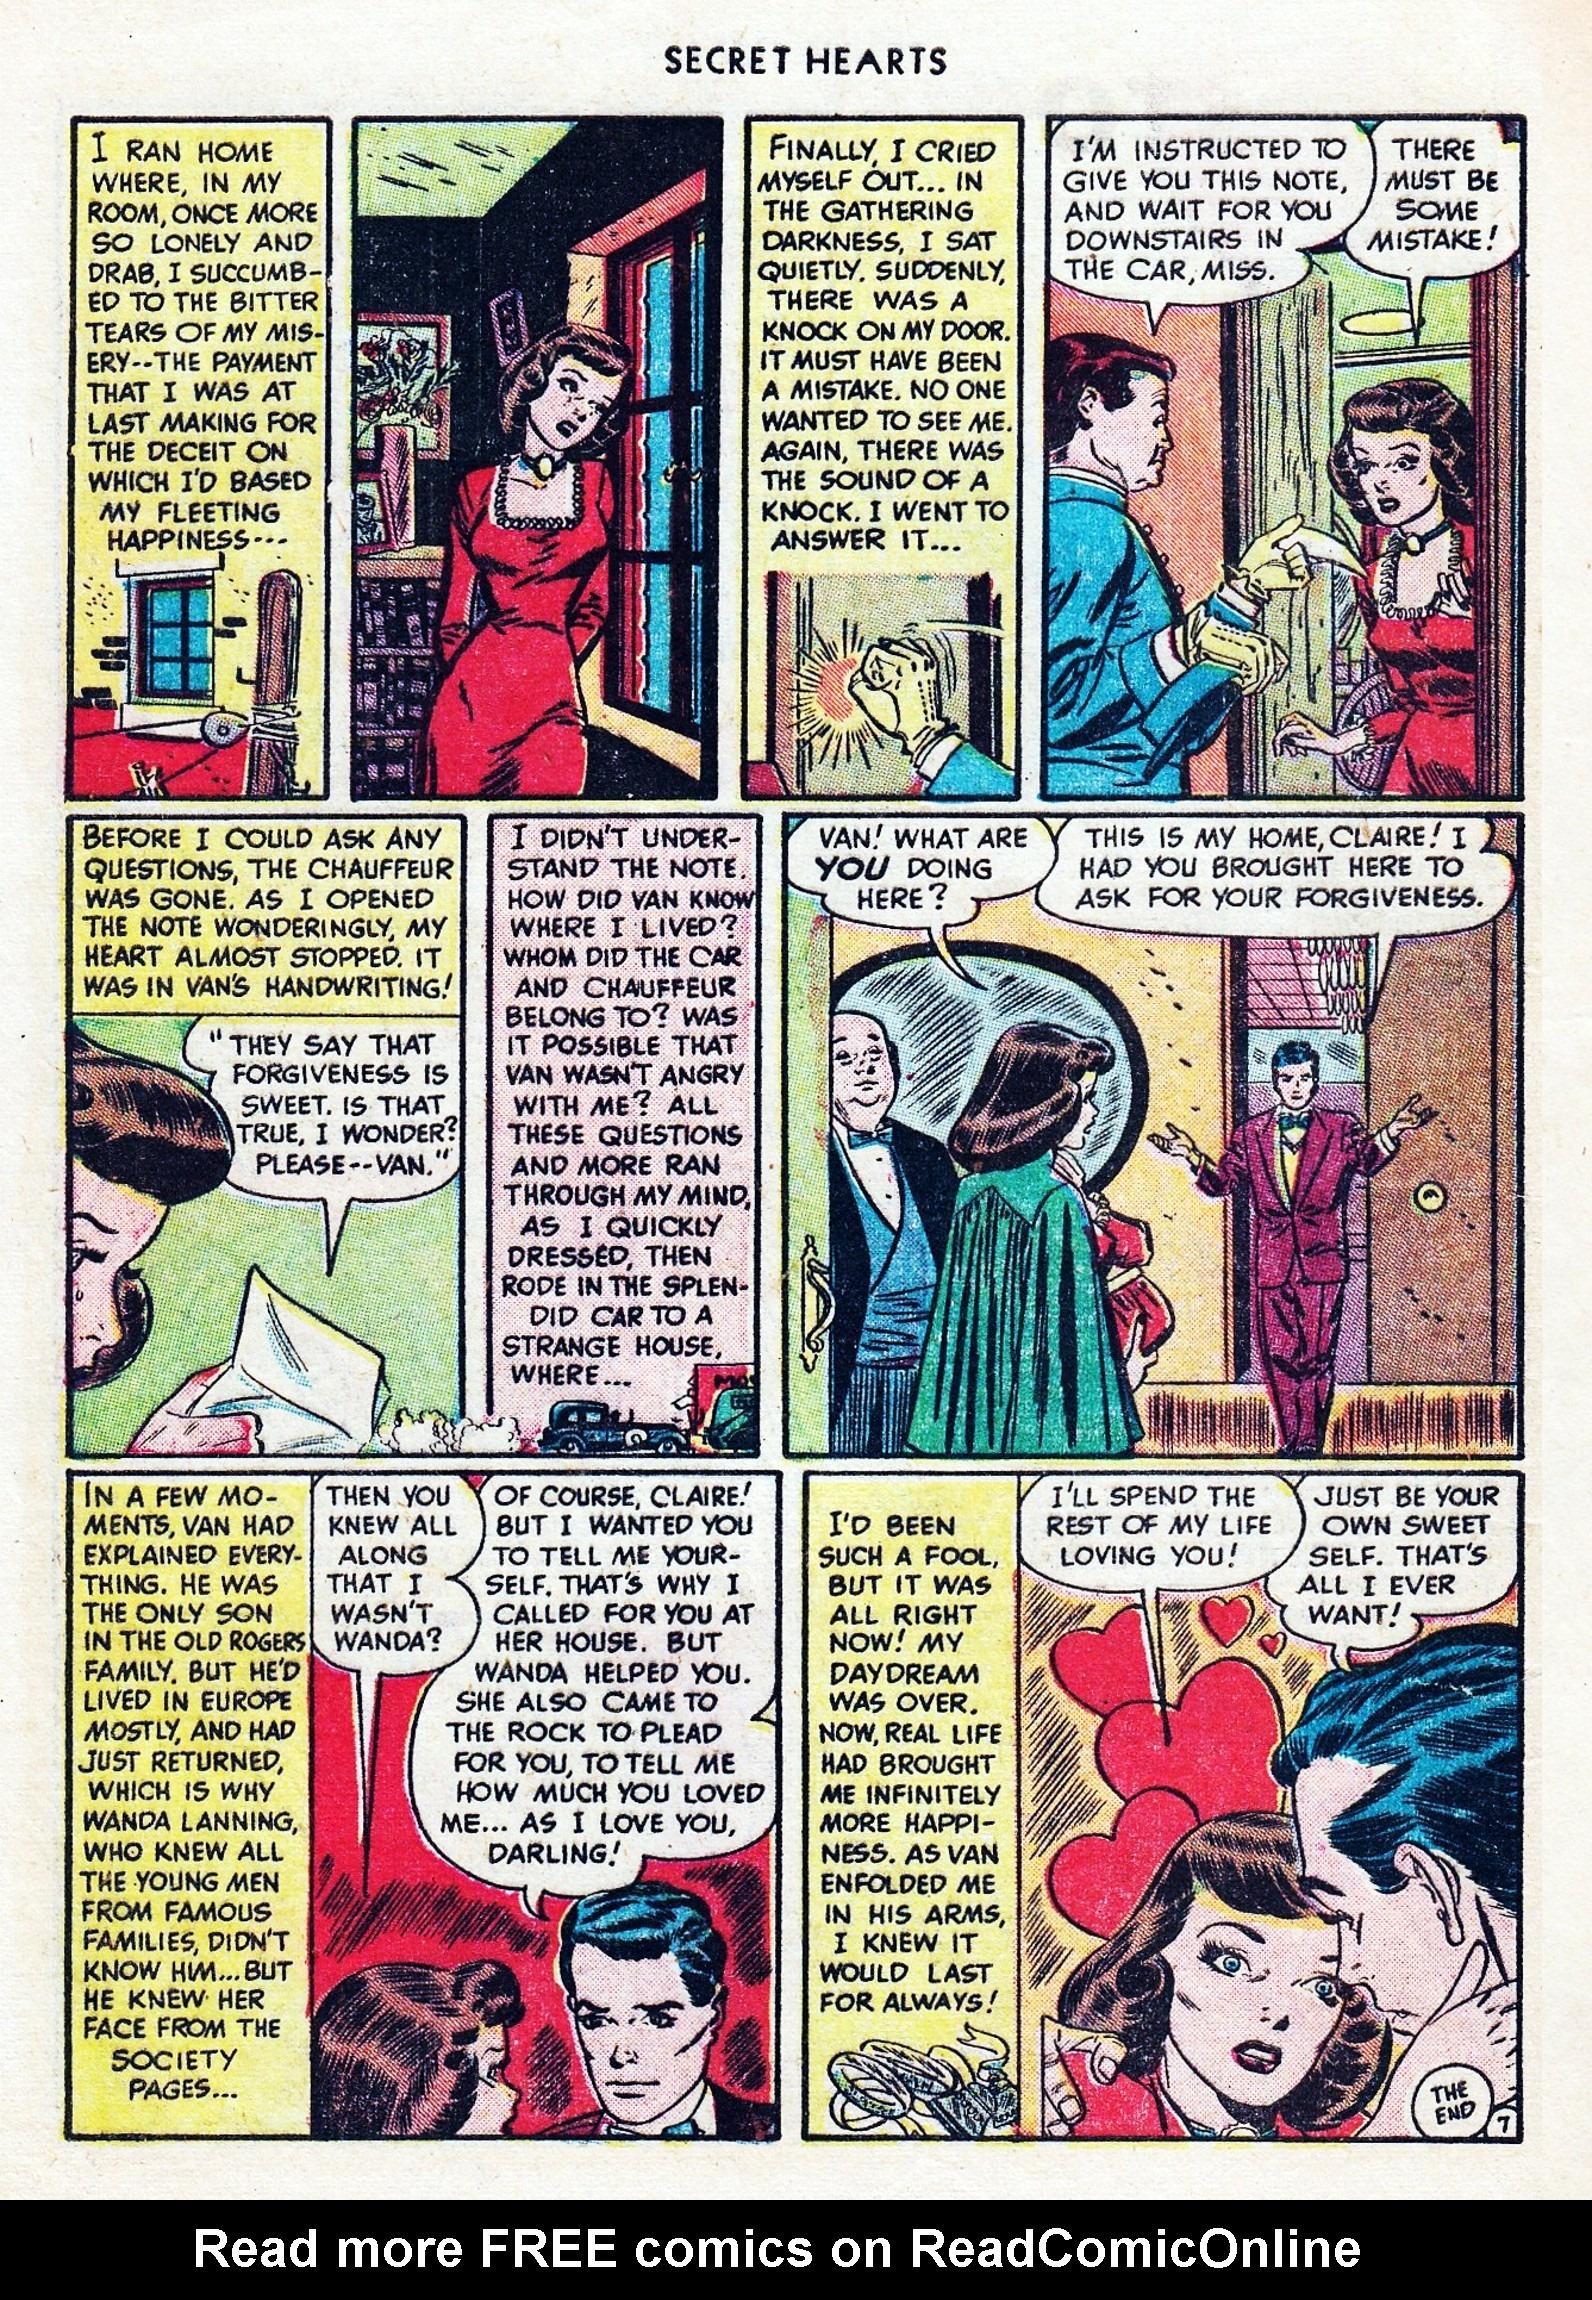 Read online Secret Hearts comic -  Issue #1 - 10